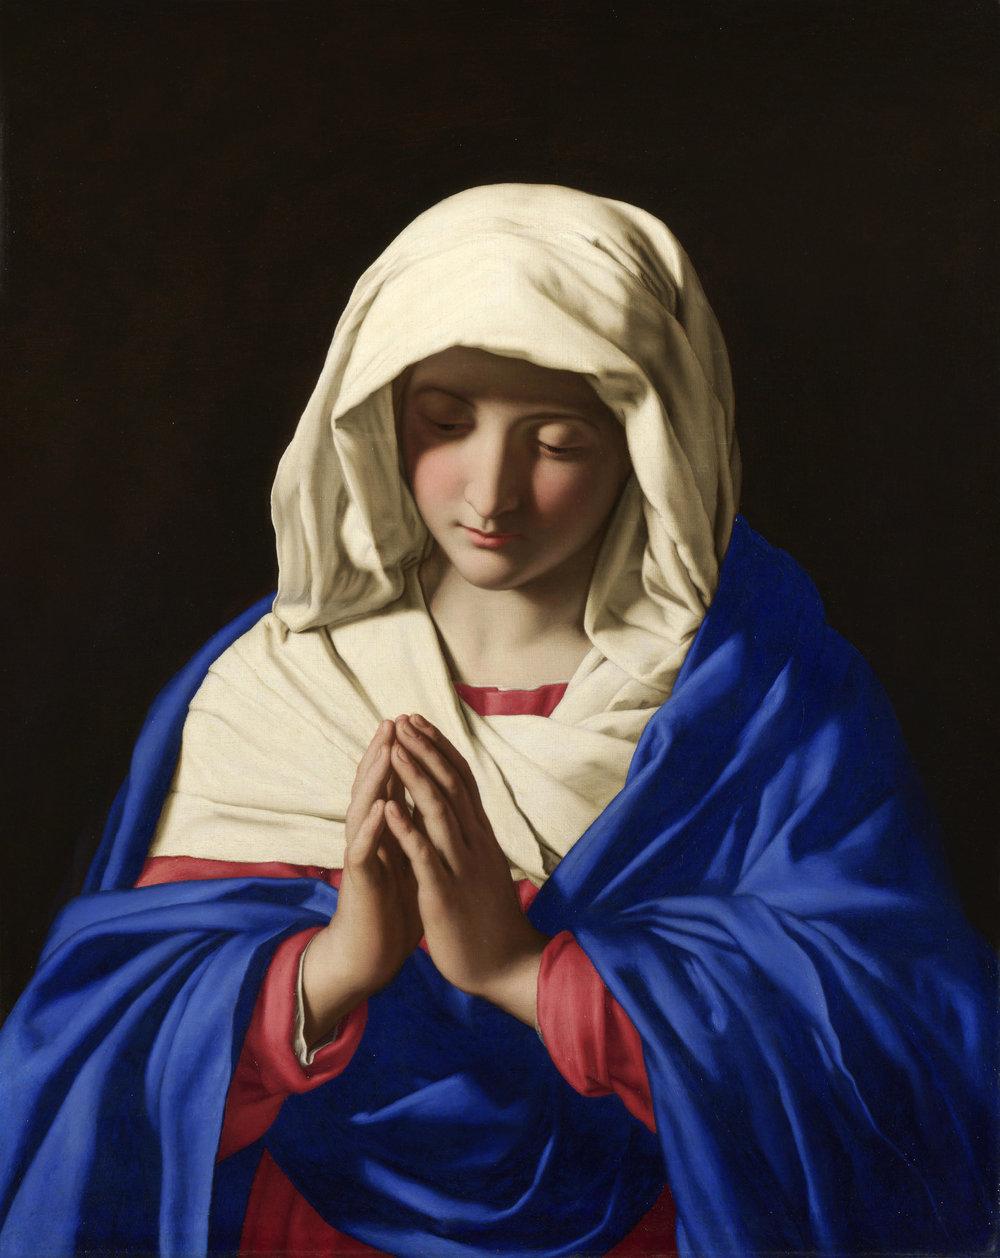 Sassoferrato - The virgin in prayer (1640-1650)